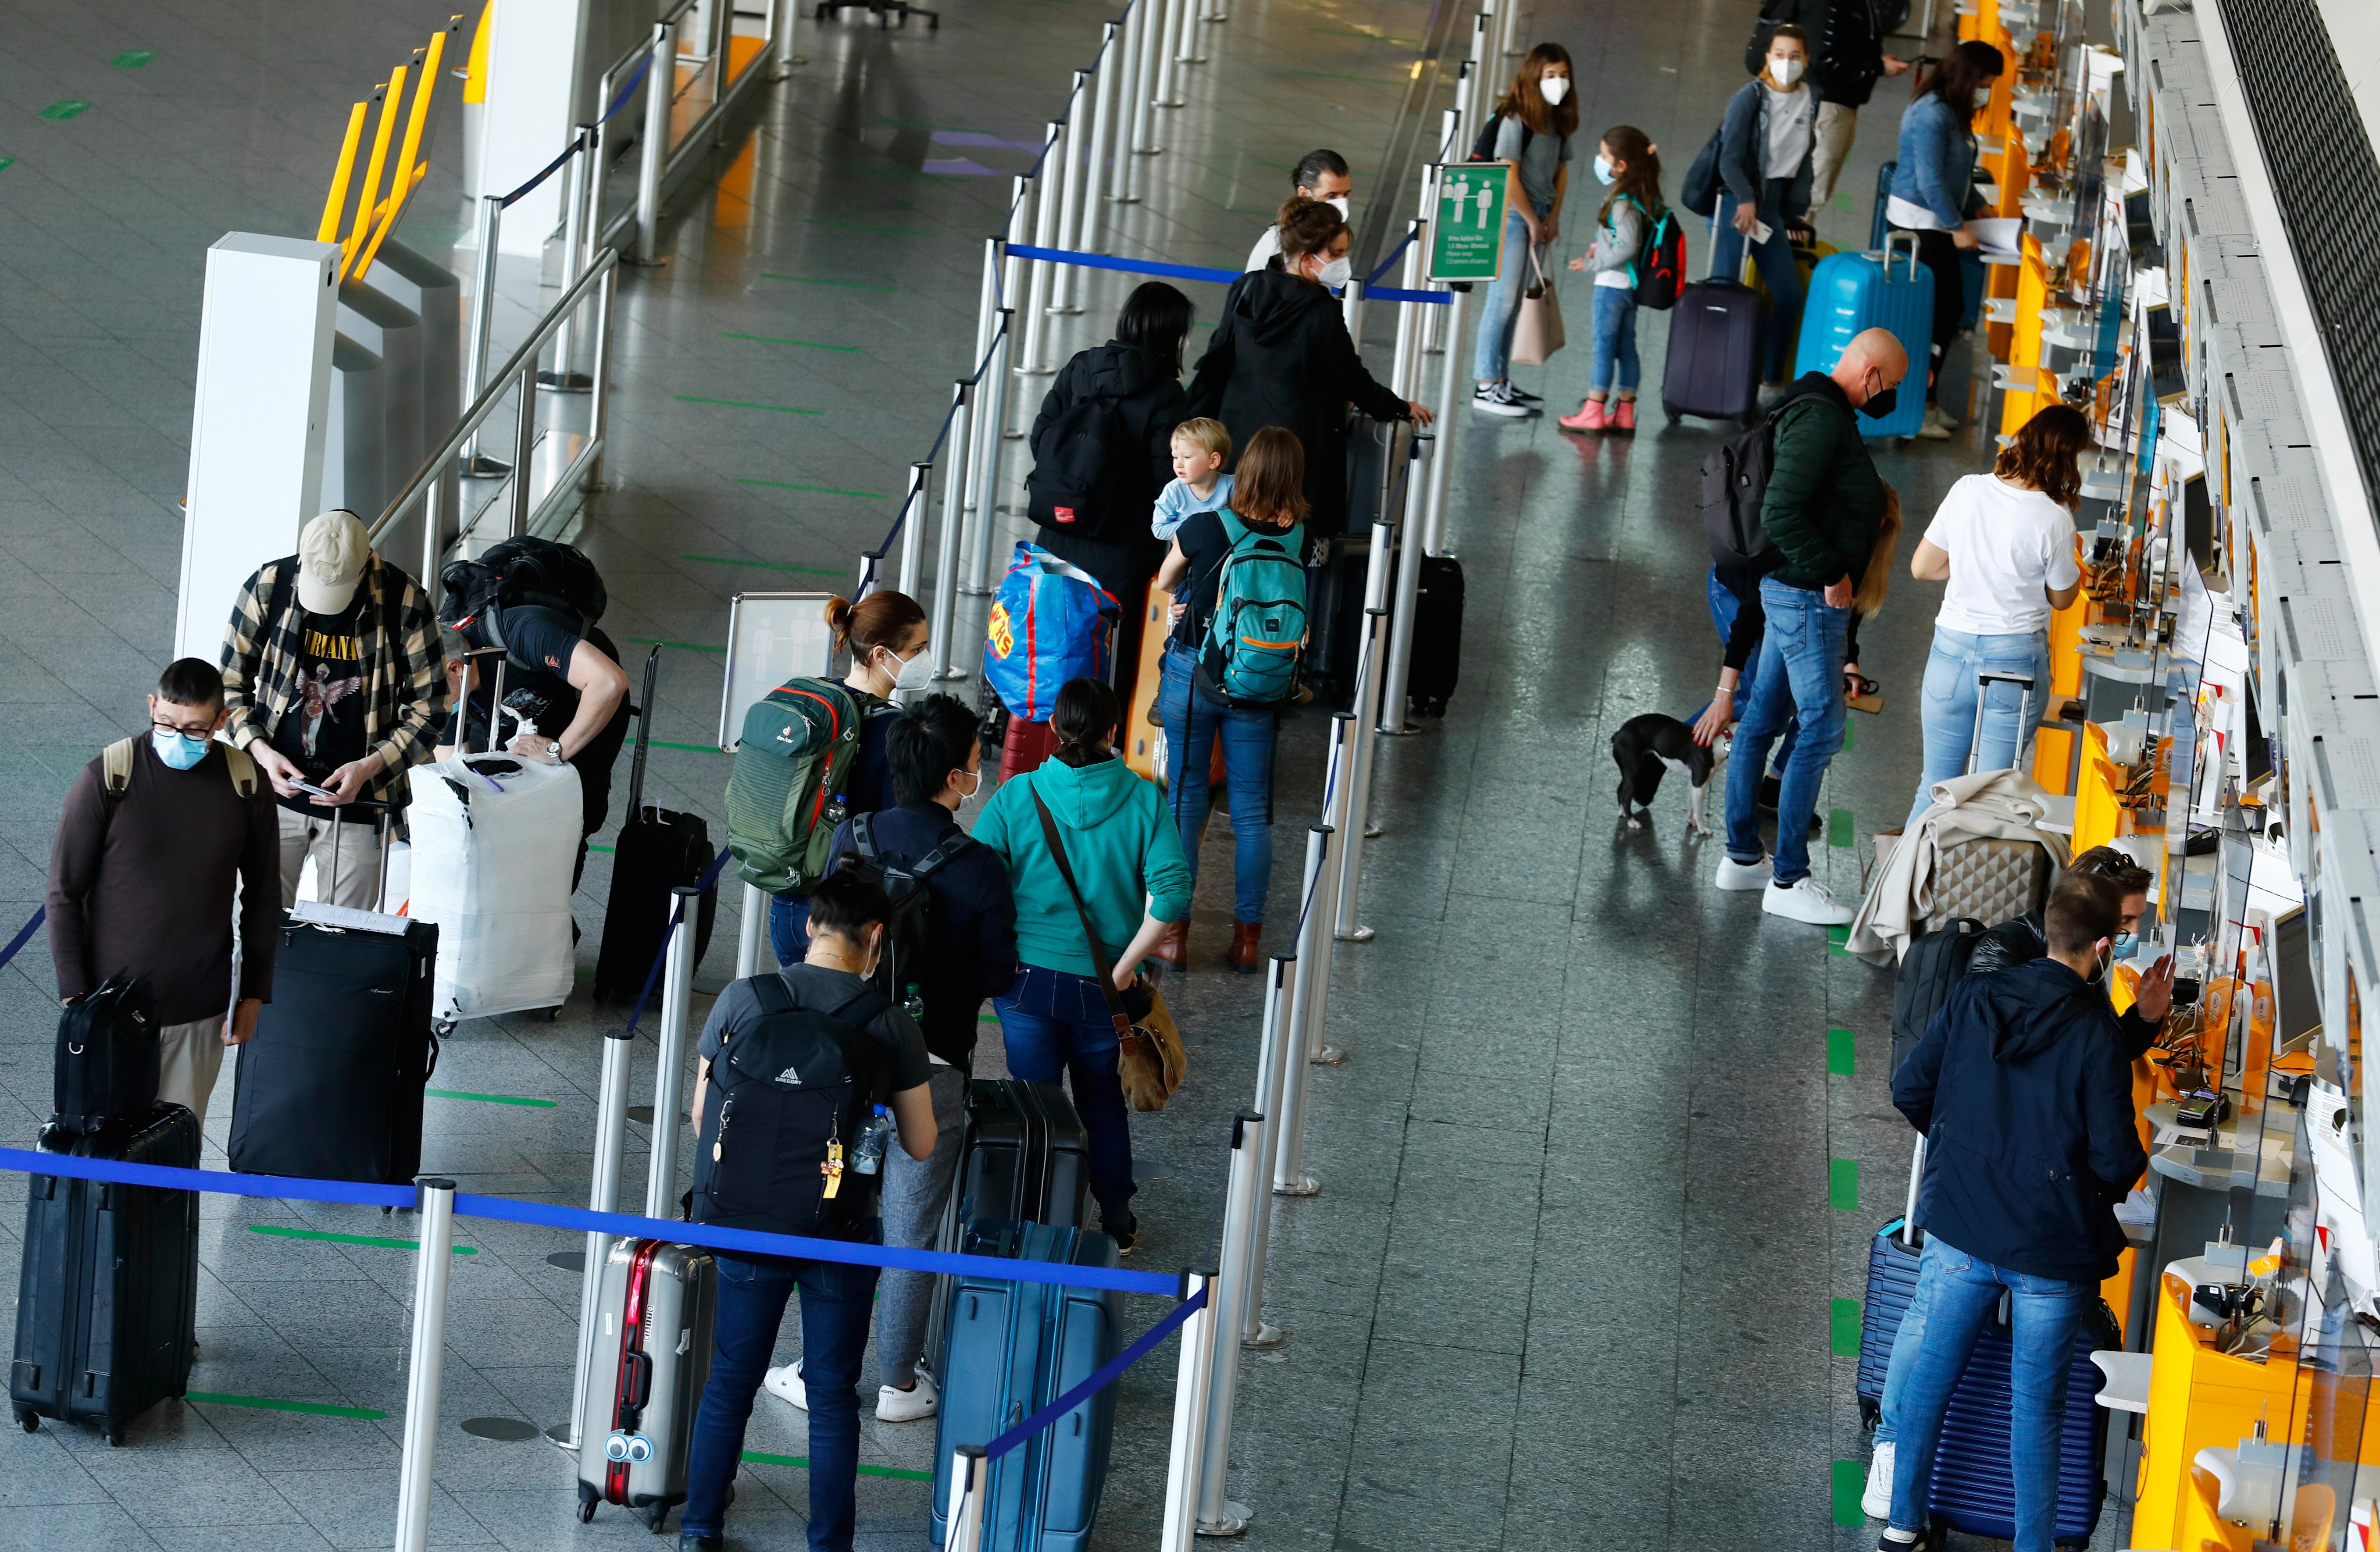 Departing passengers queue at Frankfurt Airport, as the spread of the coronavirus disease (COVID-19) continues in Frankfurt, Germany, April 1, 2021. REUTERS/Ralph Orlowski